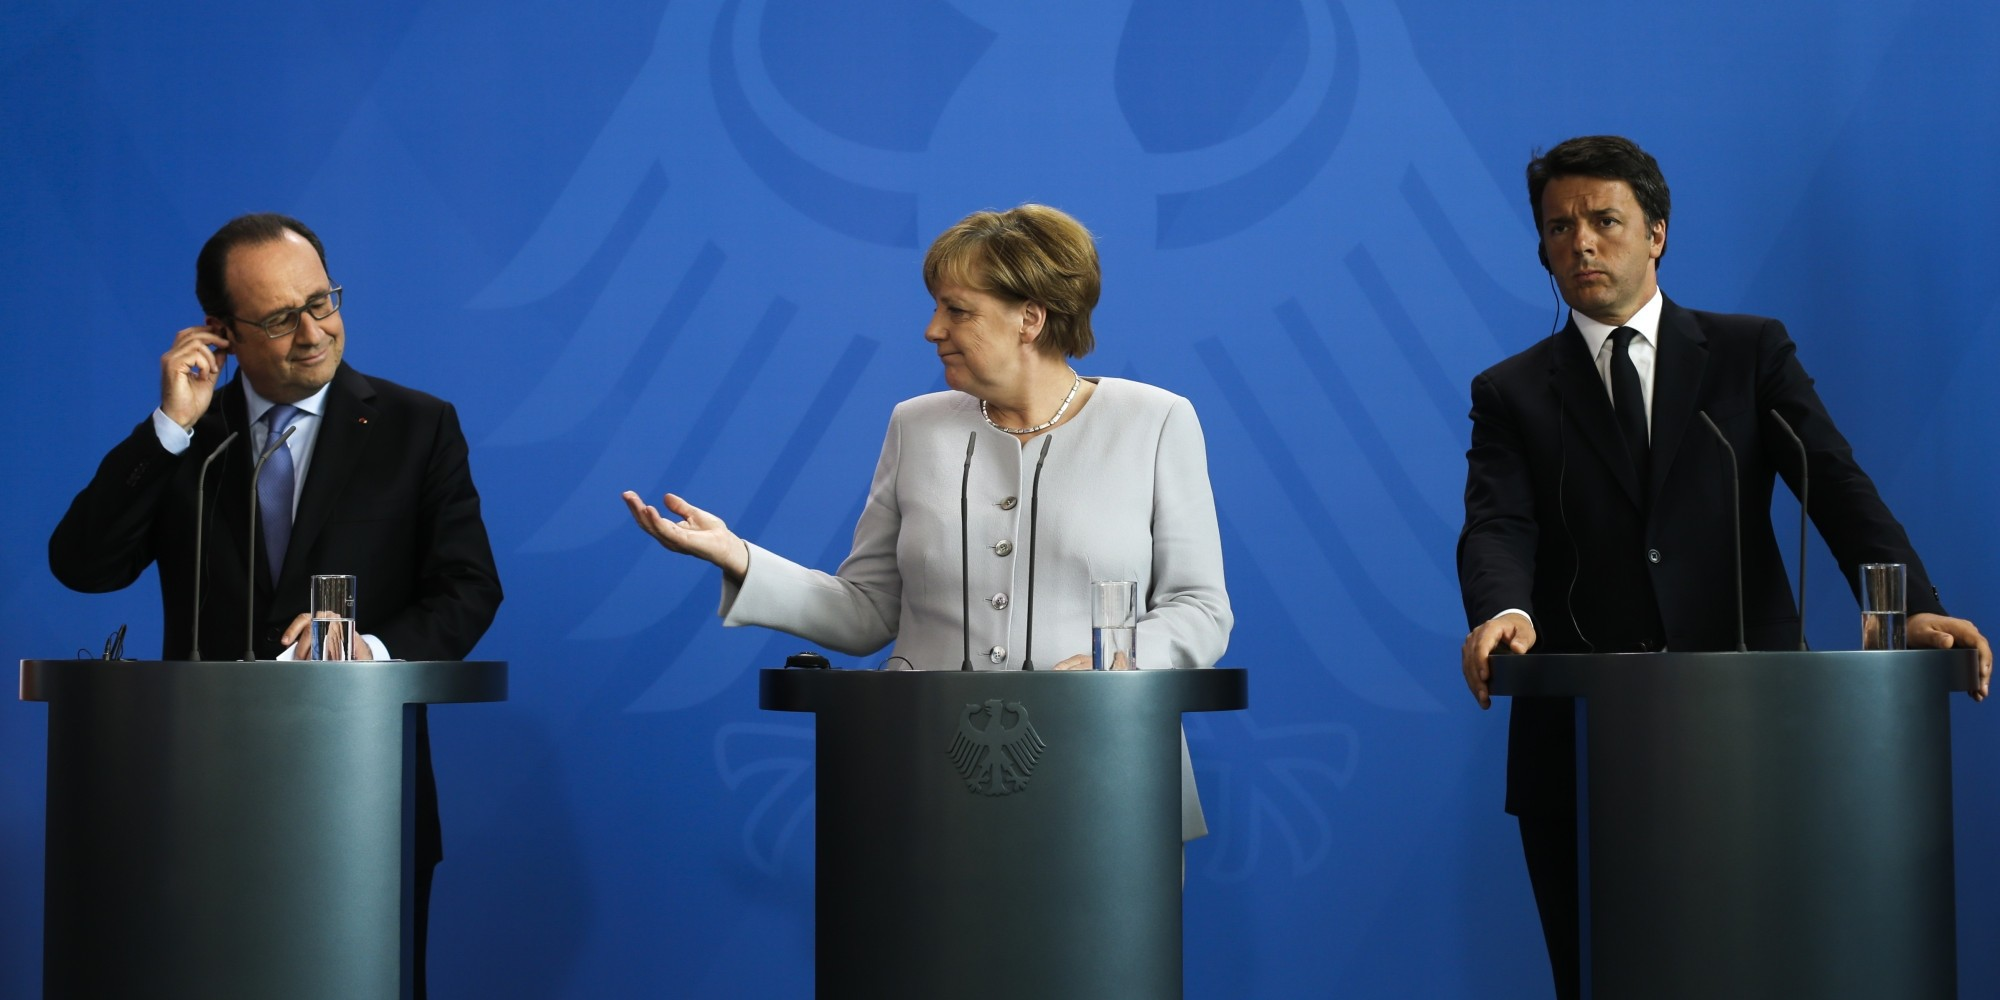 Hollande (L), Merkel (C) and Renzi